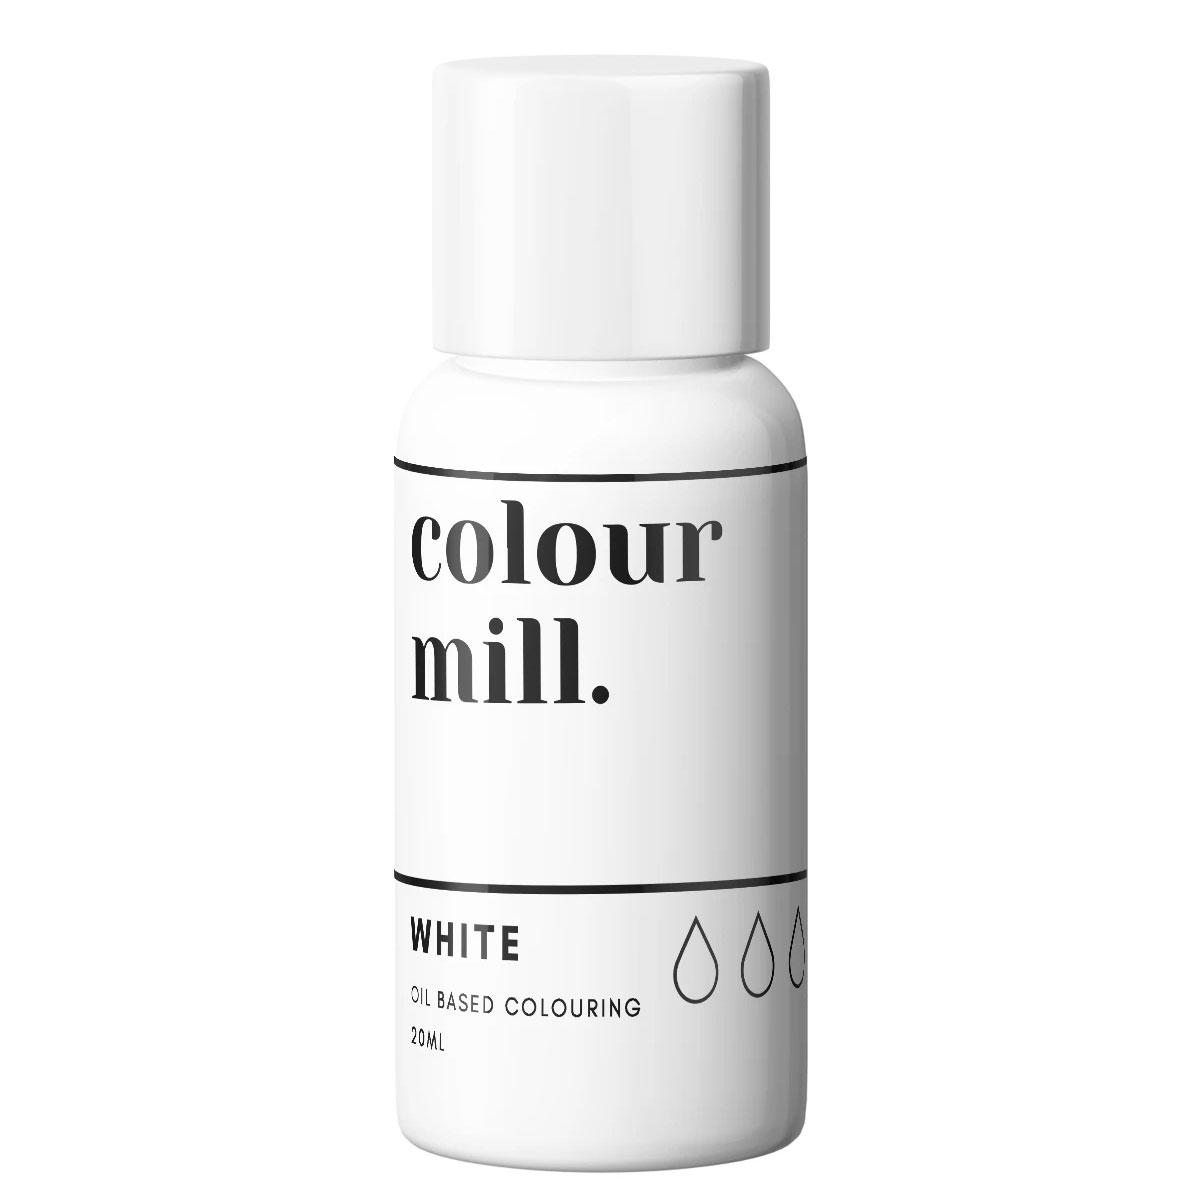 Colour Mill fettlösliche Lebensmittelfarbe - Weiß 20ml